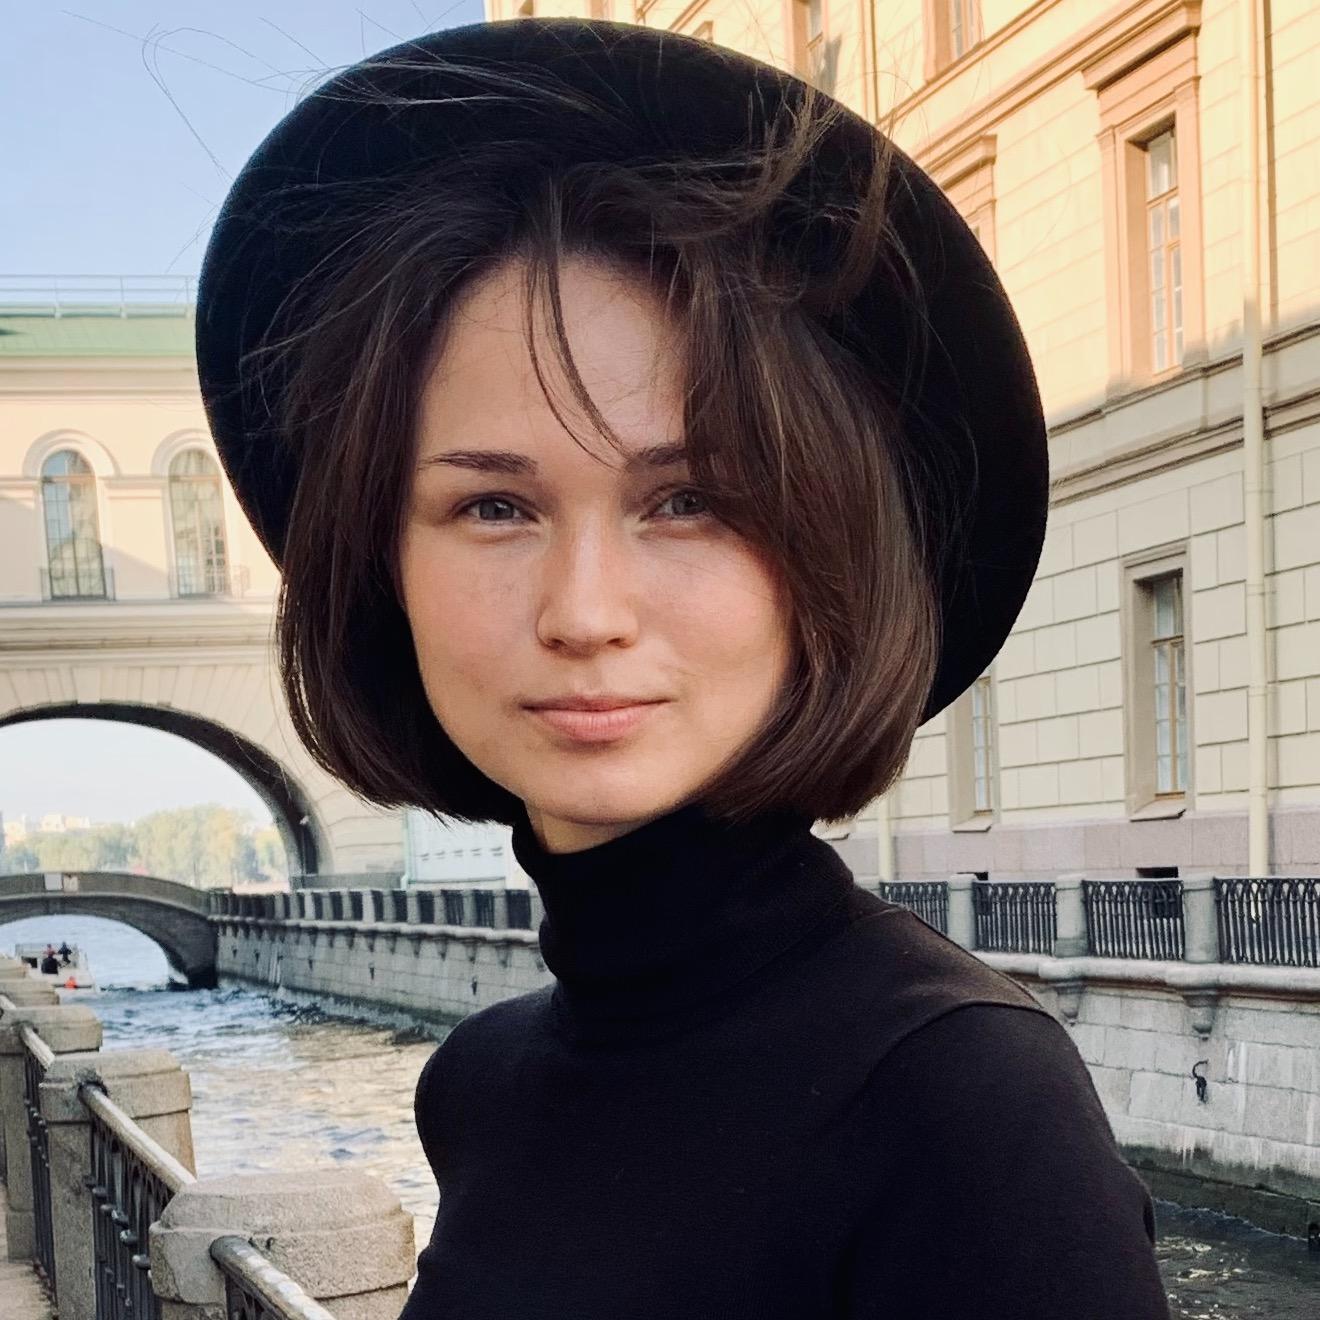 lioka_v